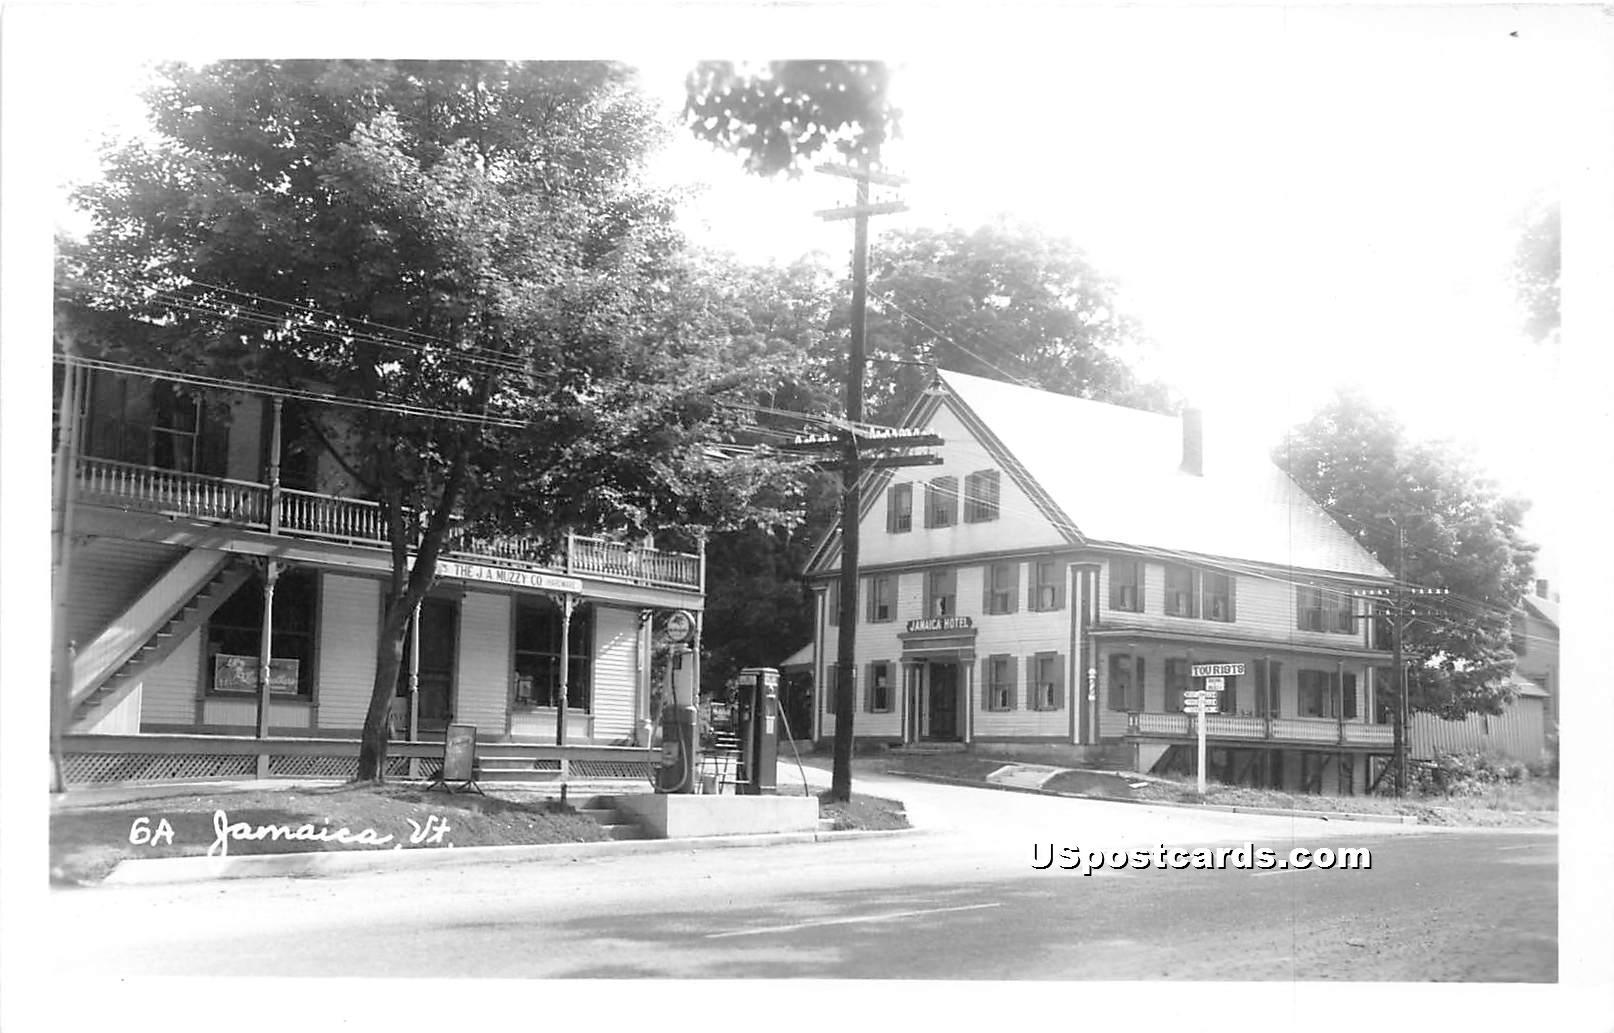 Jamaica Hotel - Vermont VT Postcard